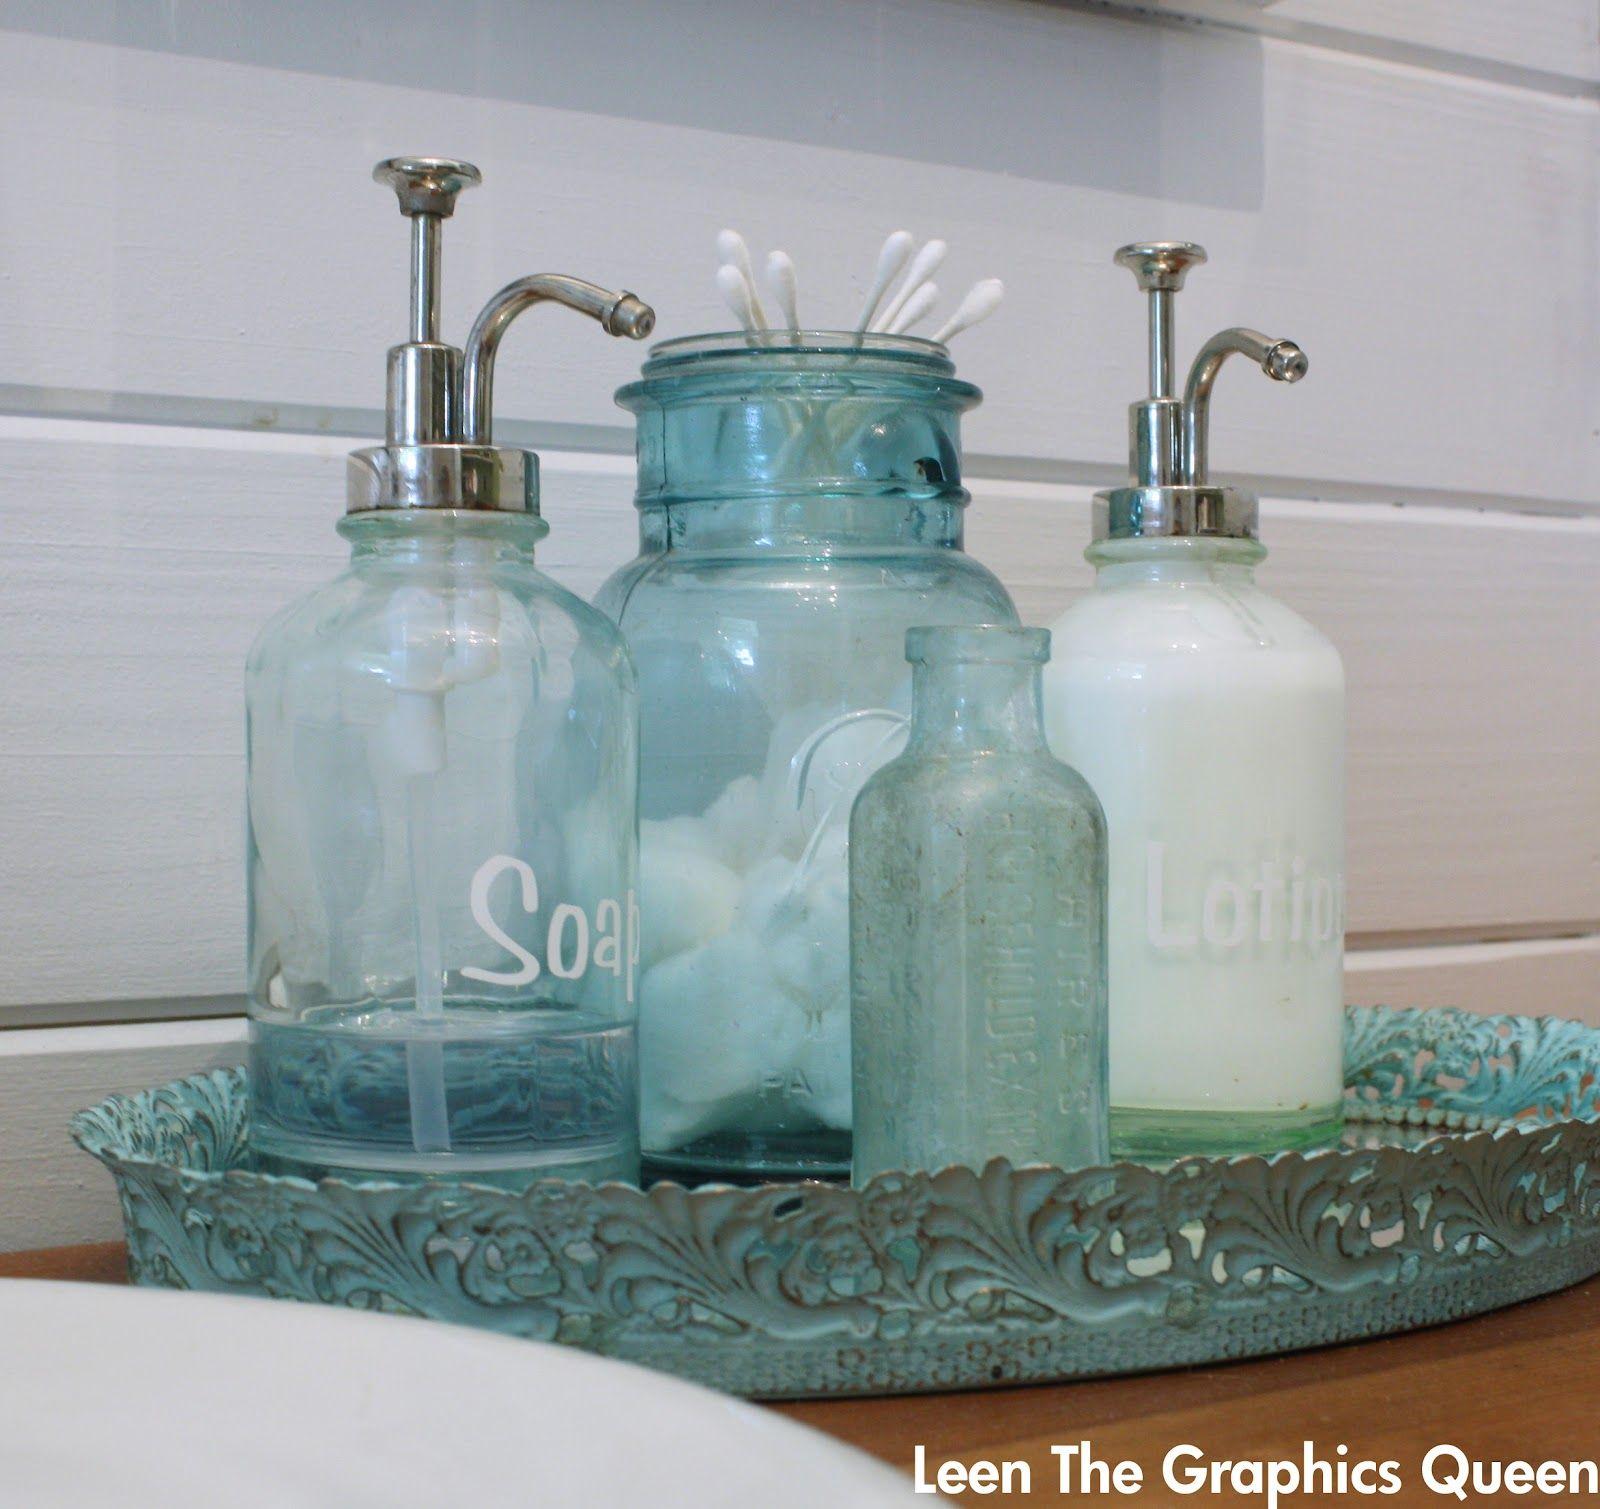 Sea Glass Inspired Bathroom Remodel Beach Theme Bathroom Funny Bathroom Decor Beach Bathroom Decor Sea glass bathroom decor